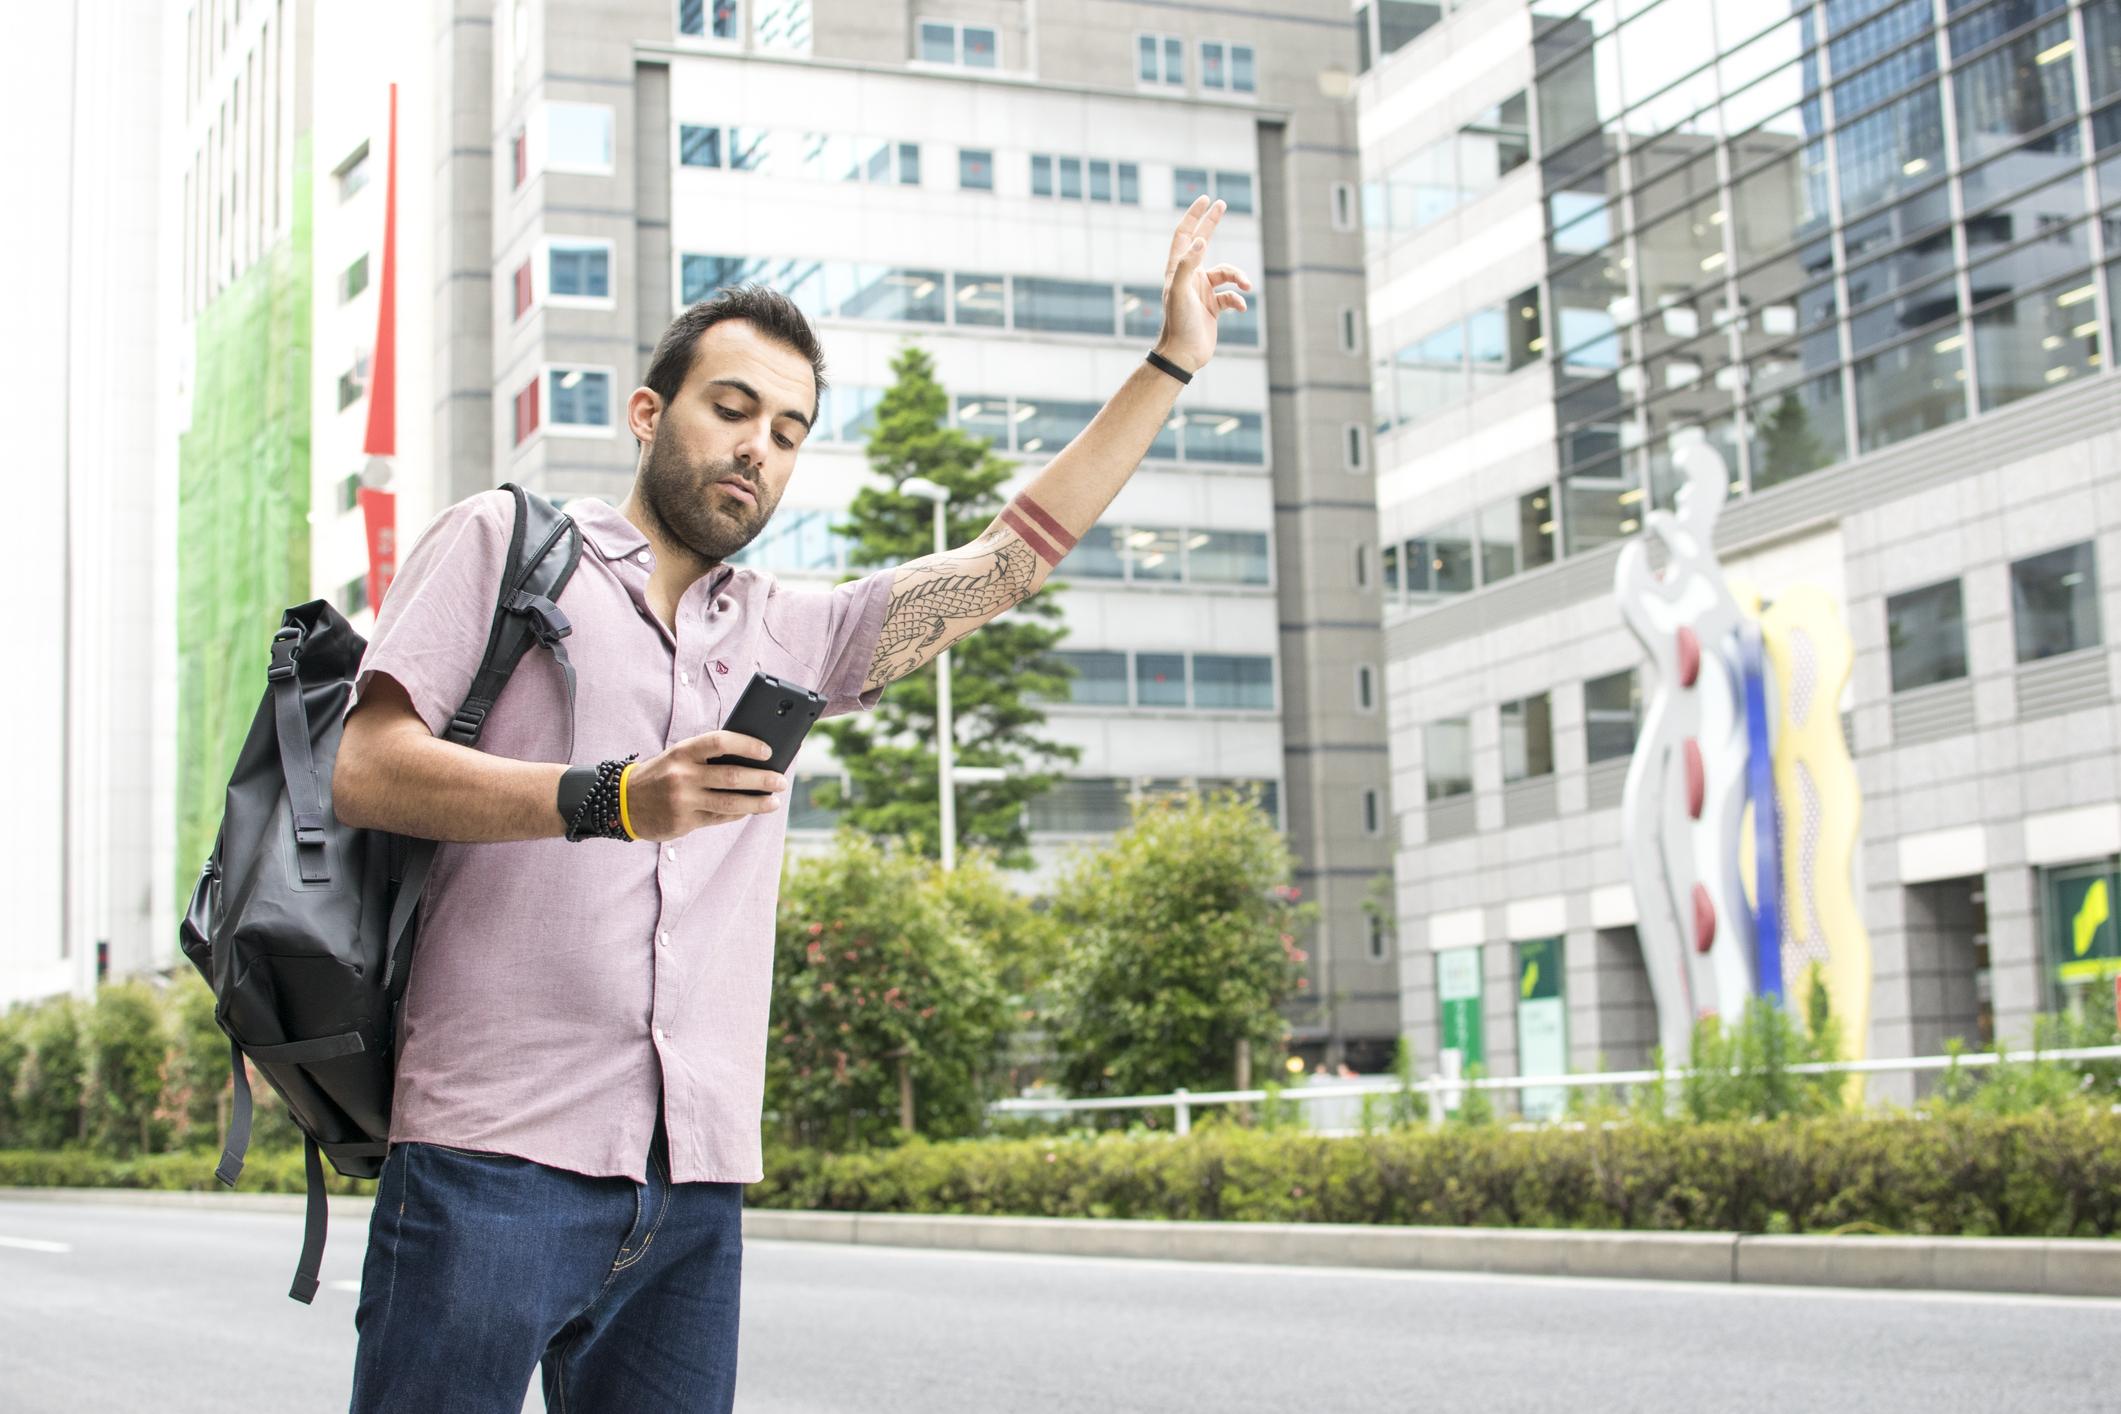 Man using smartphone for ridehailing